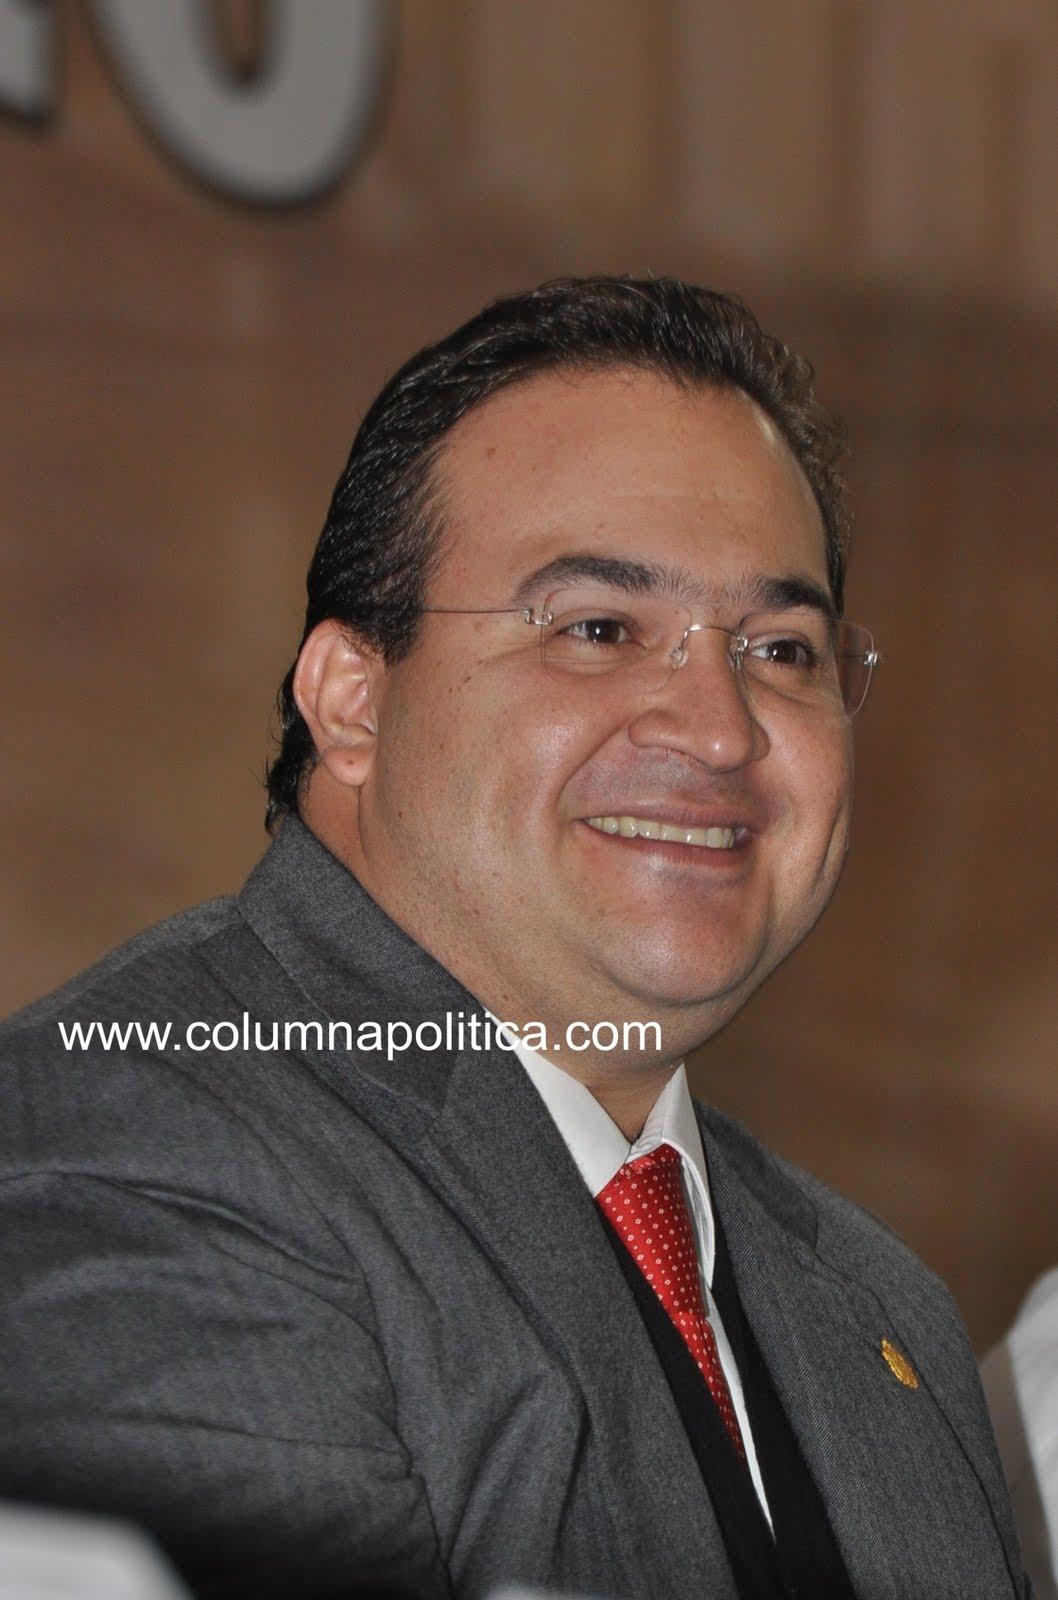 XALAPA, VER. 08 de Febrero de 2011.- El gobernador Javier Duarte de Ochoa, ...